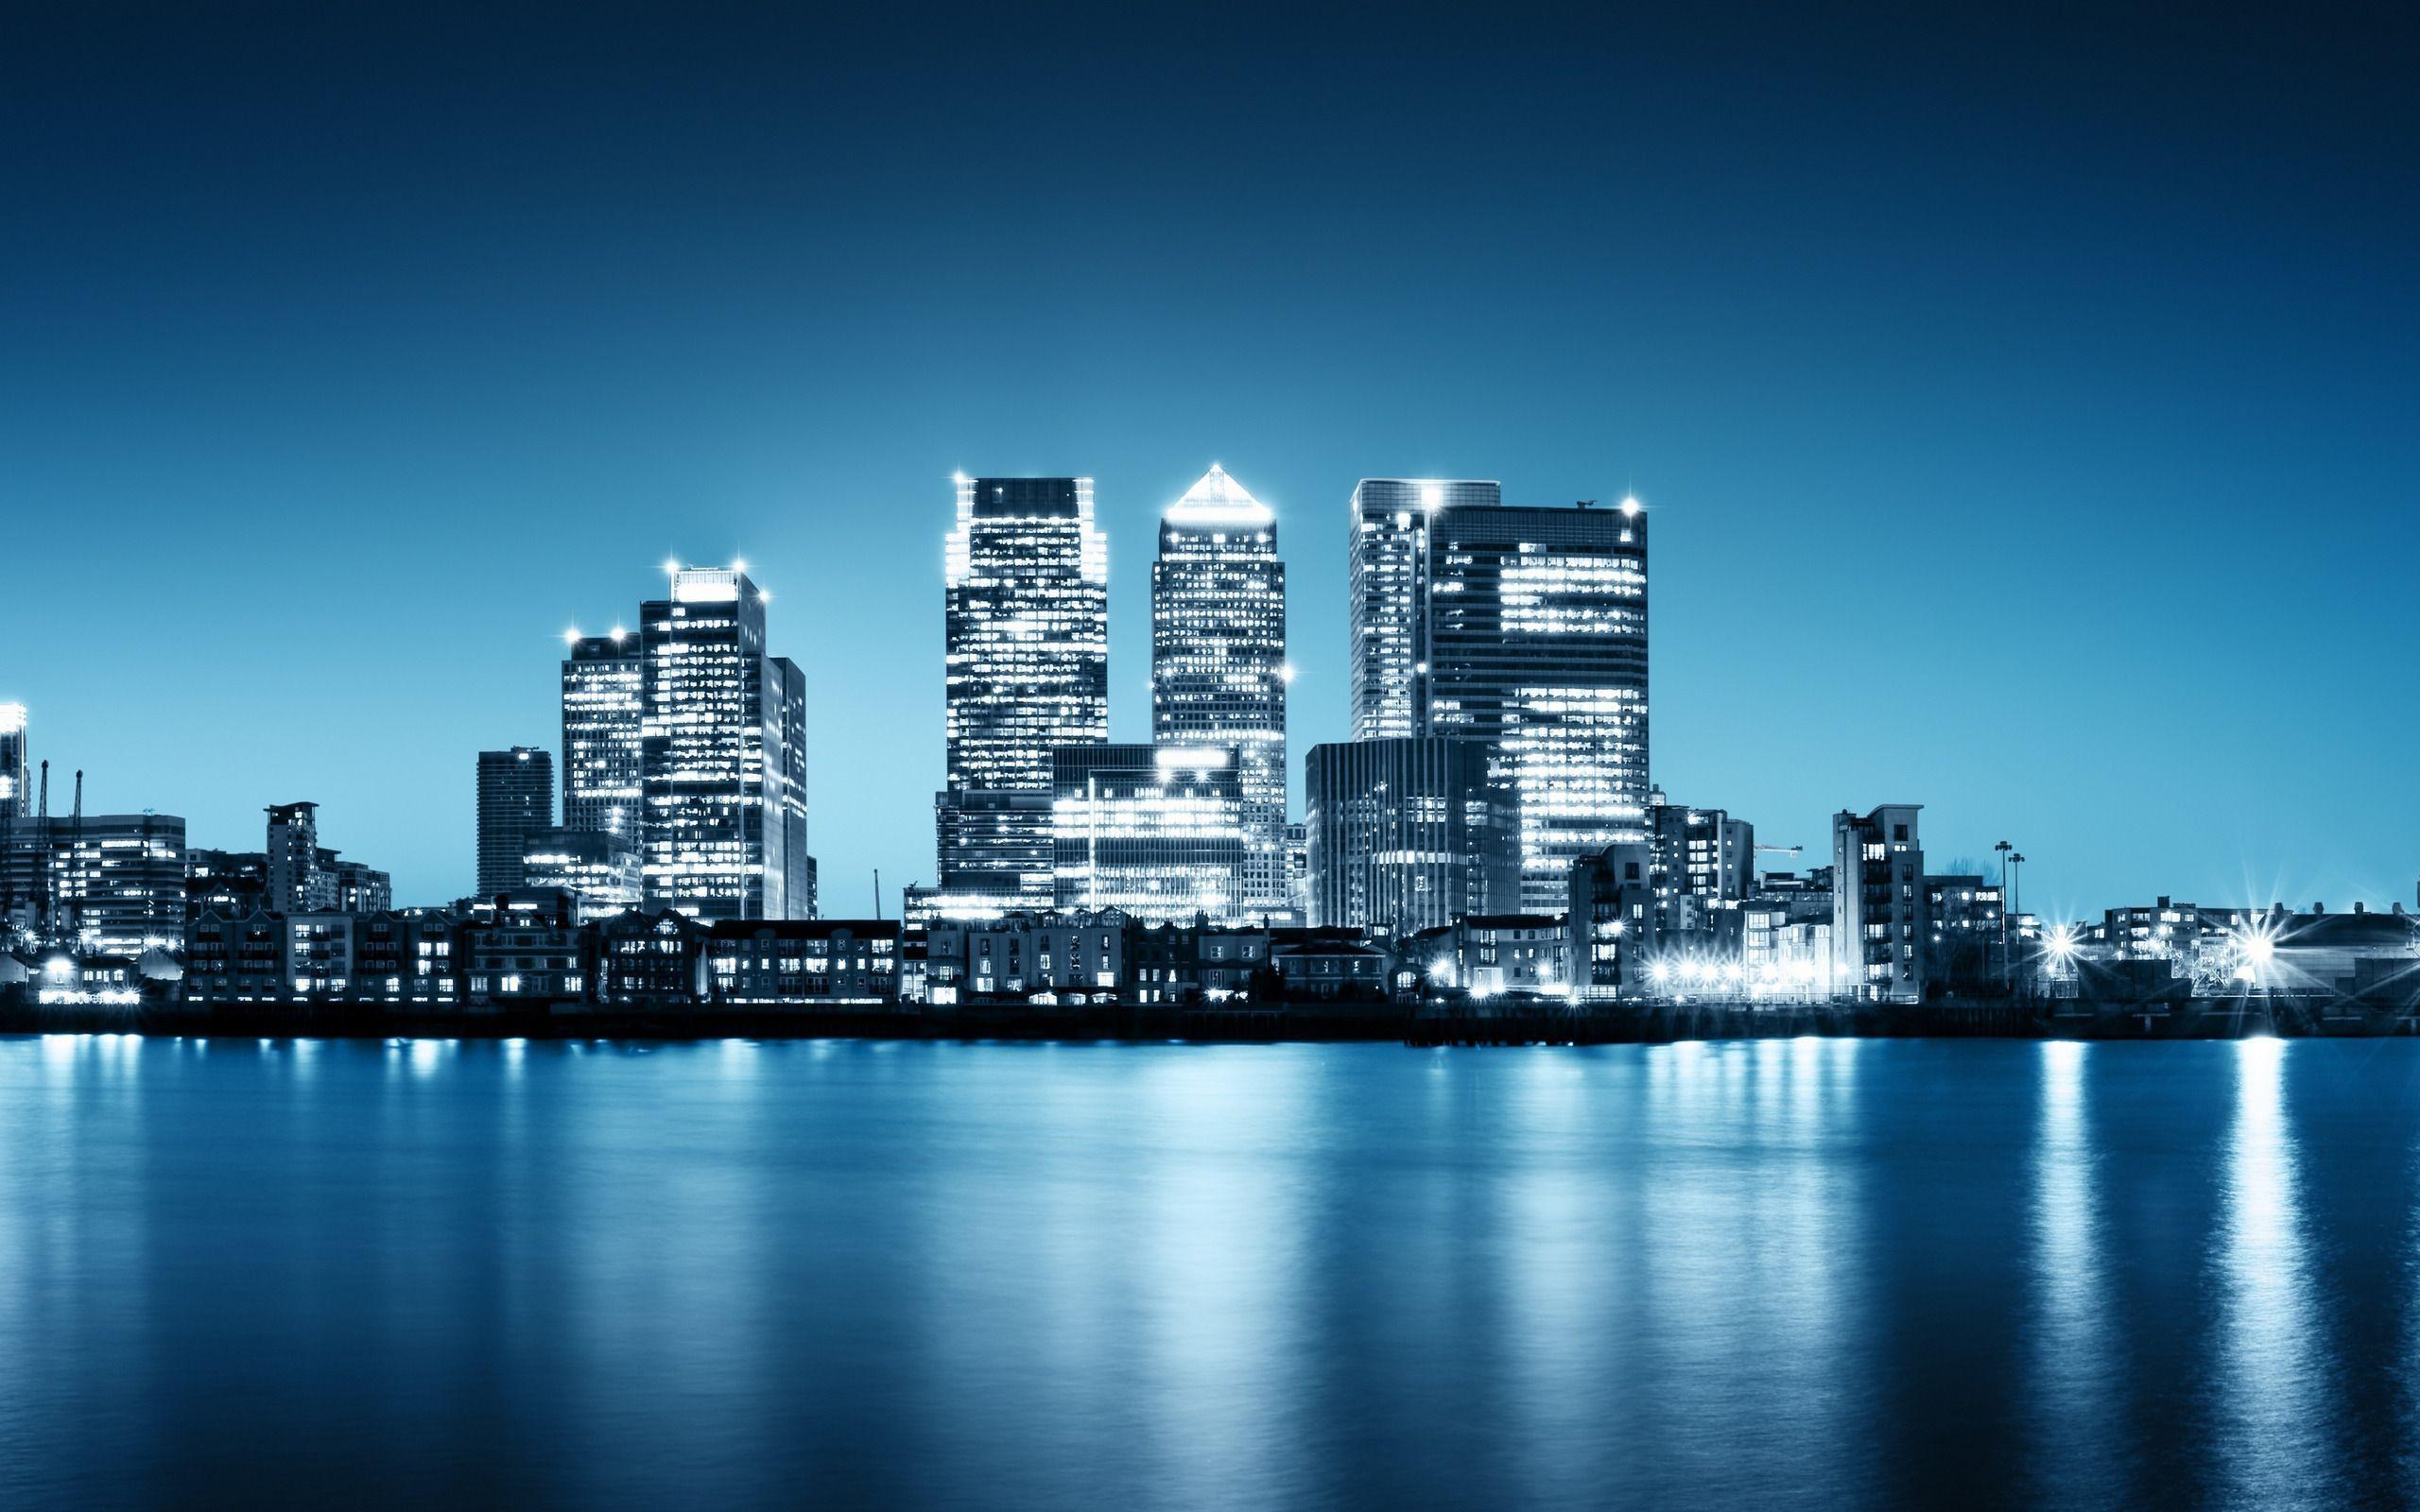 City Night Skyline Wallpapers